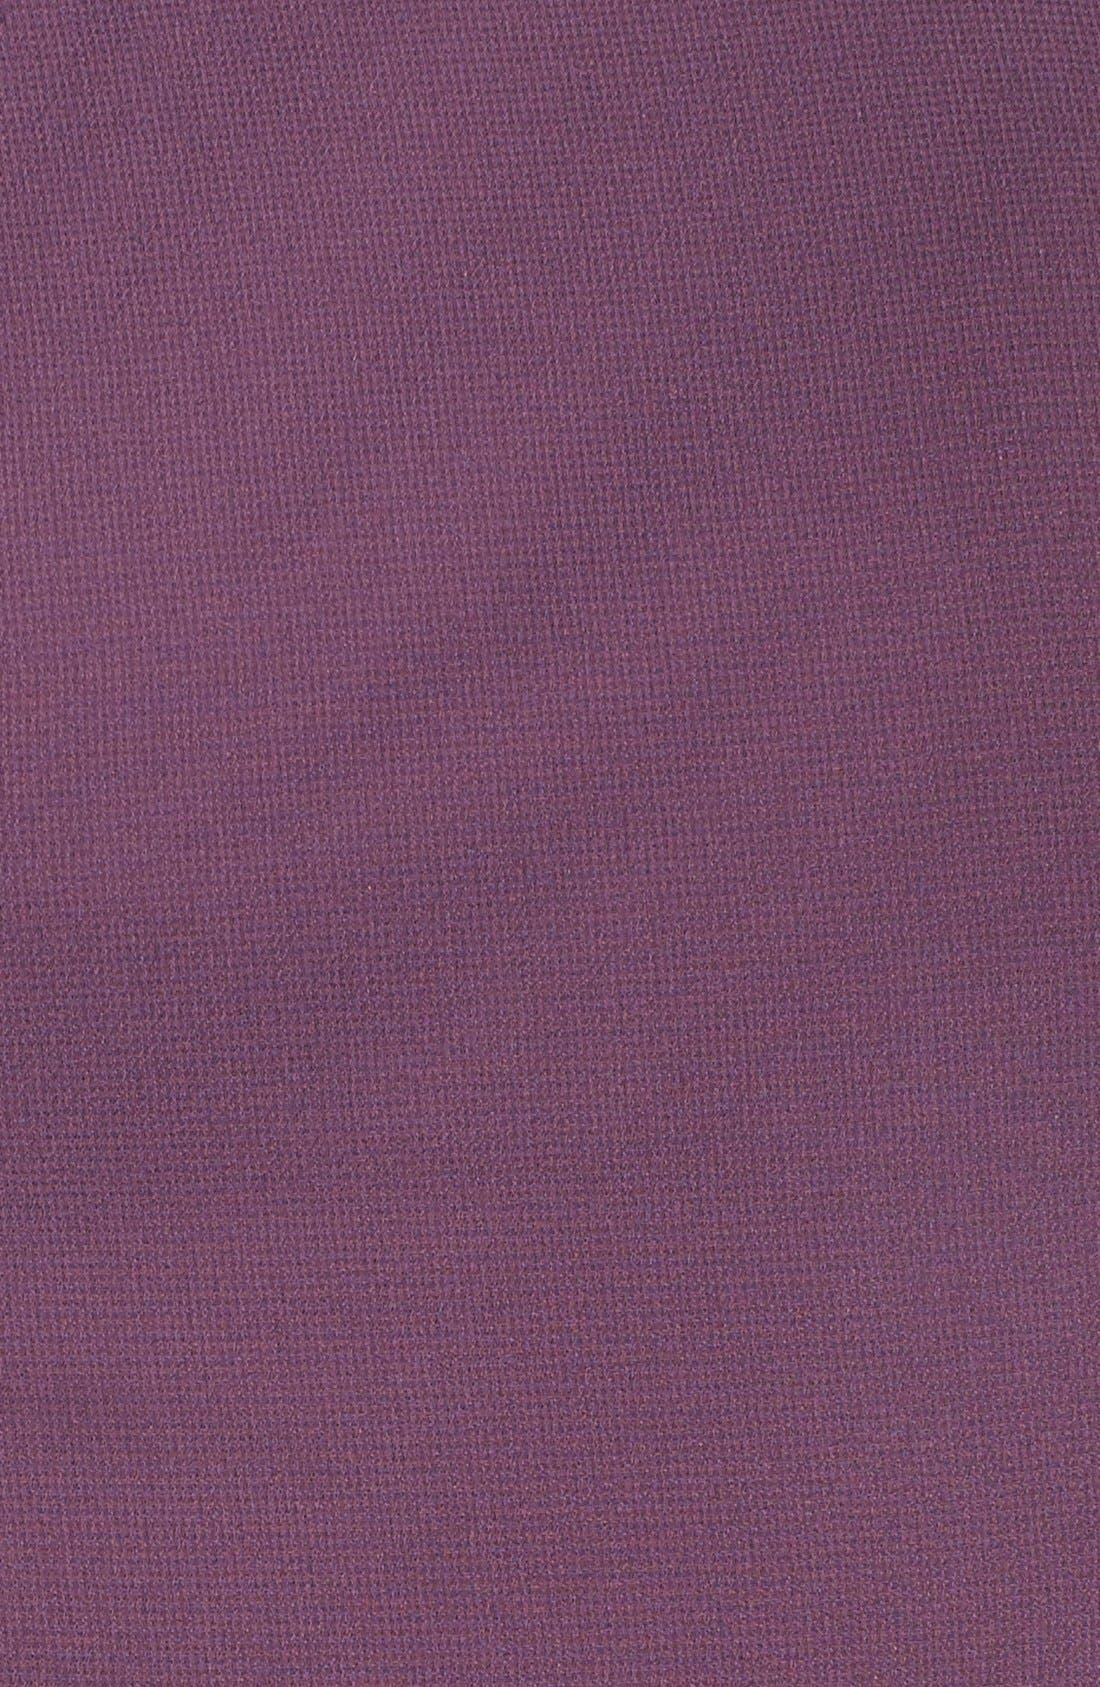 Cross Neck A-Line Chiffon Gown,                             Alternate thumbnail 5, color,                             Dusty Purple